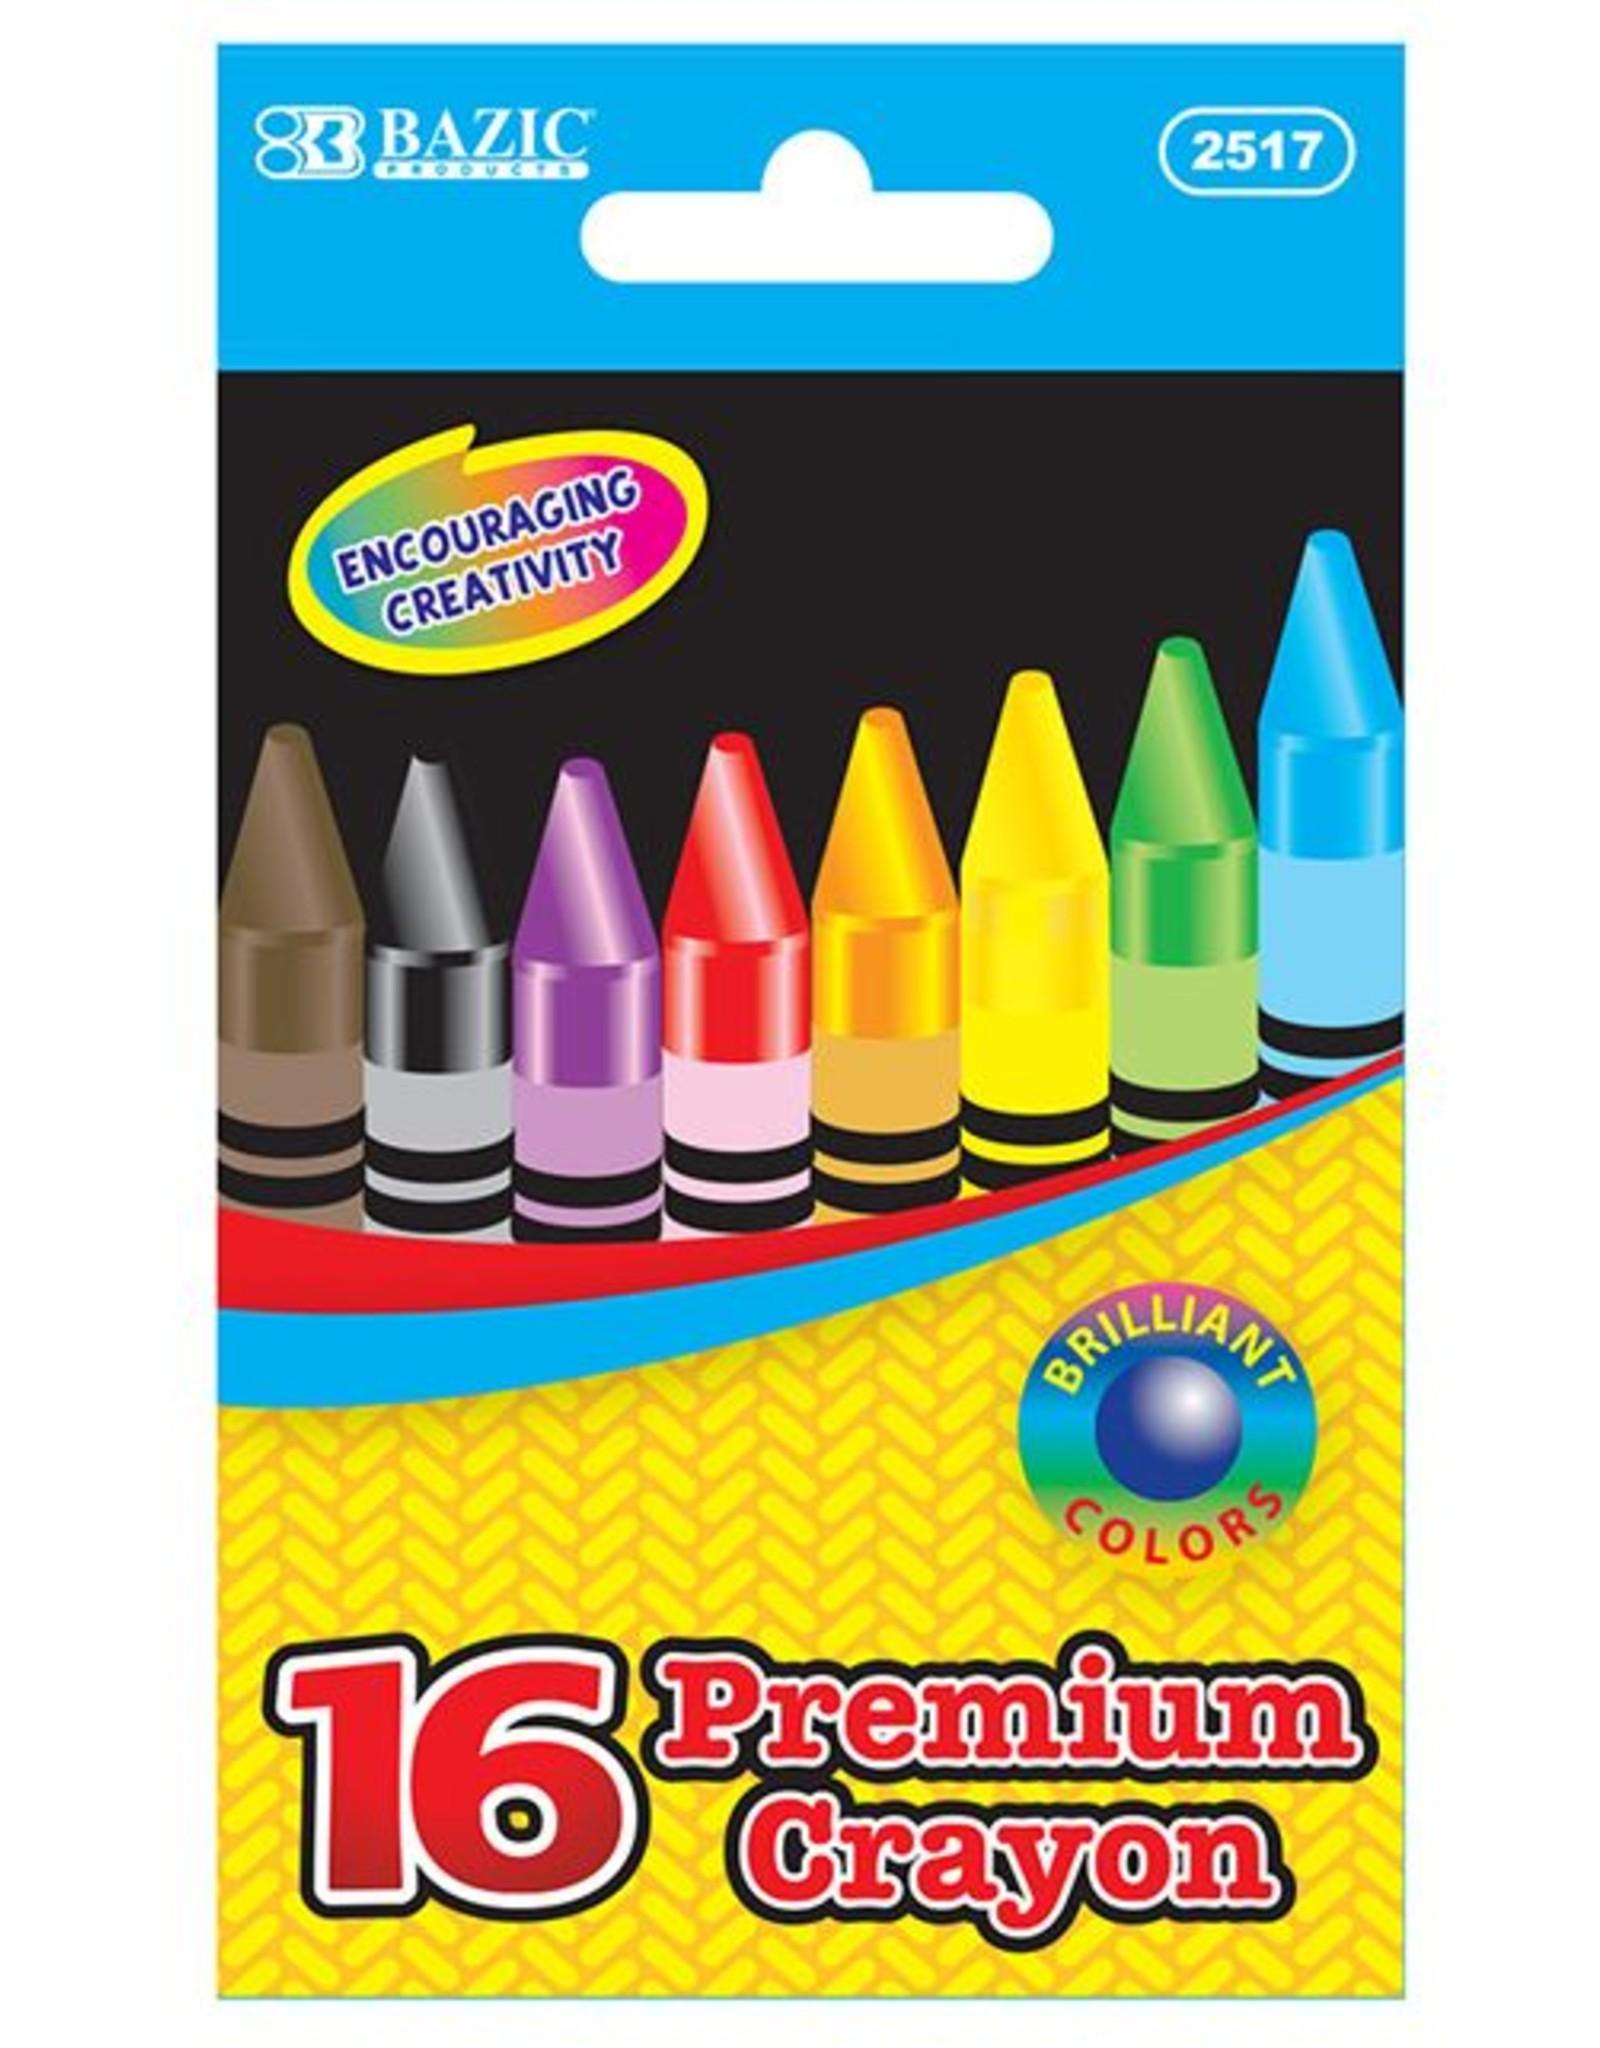 16 Premium Quality Crayon